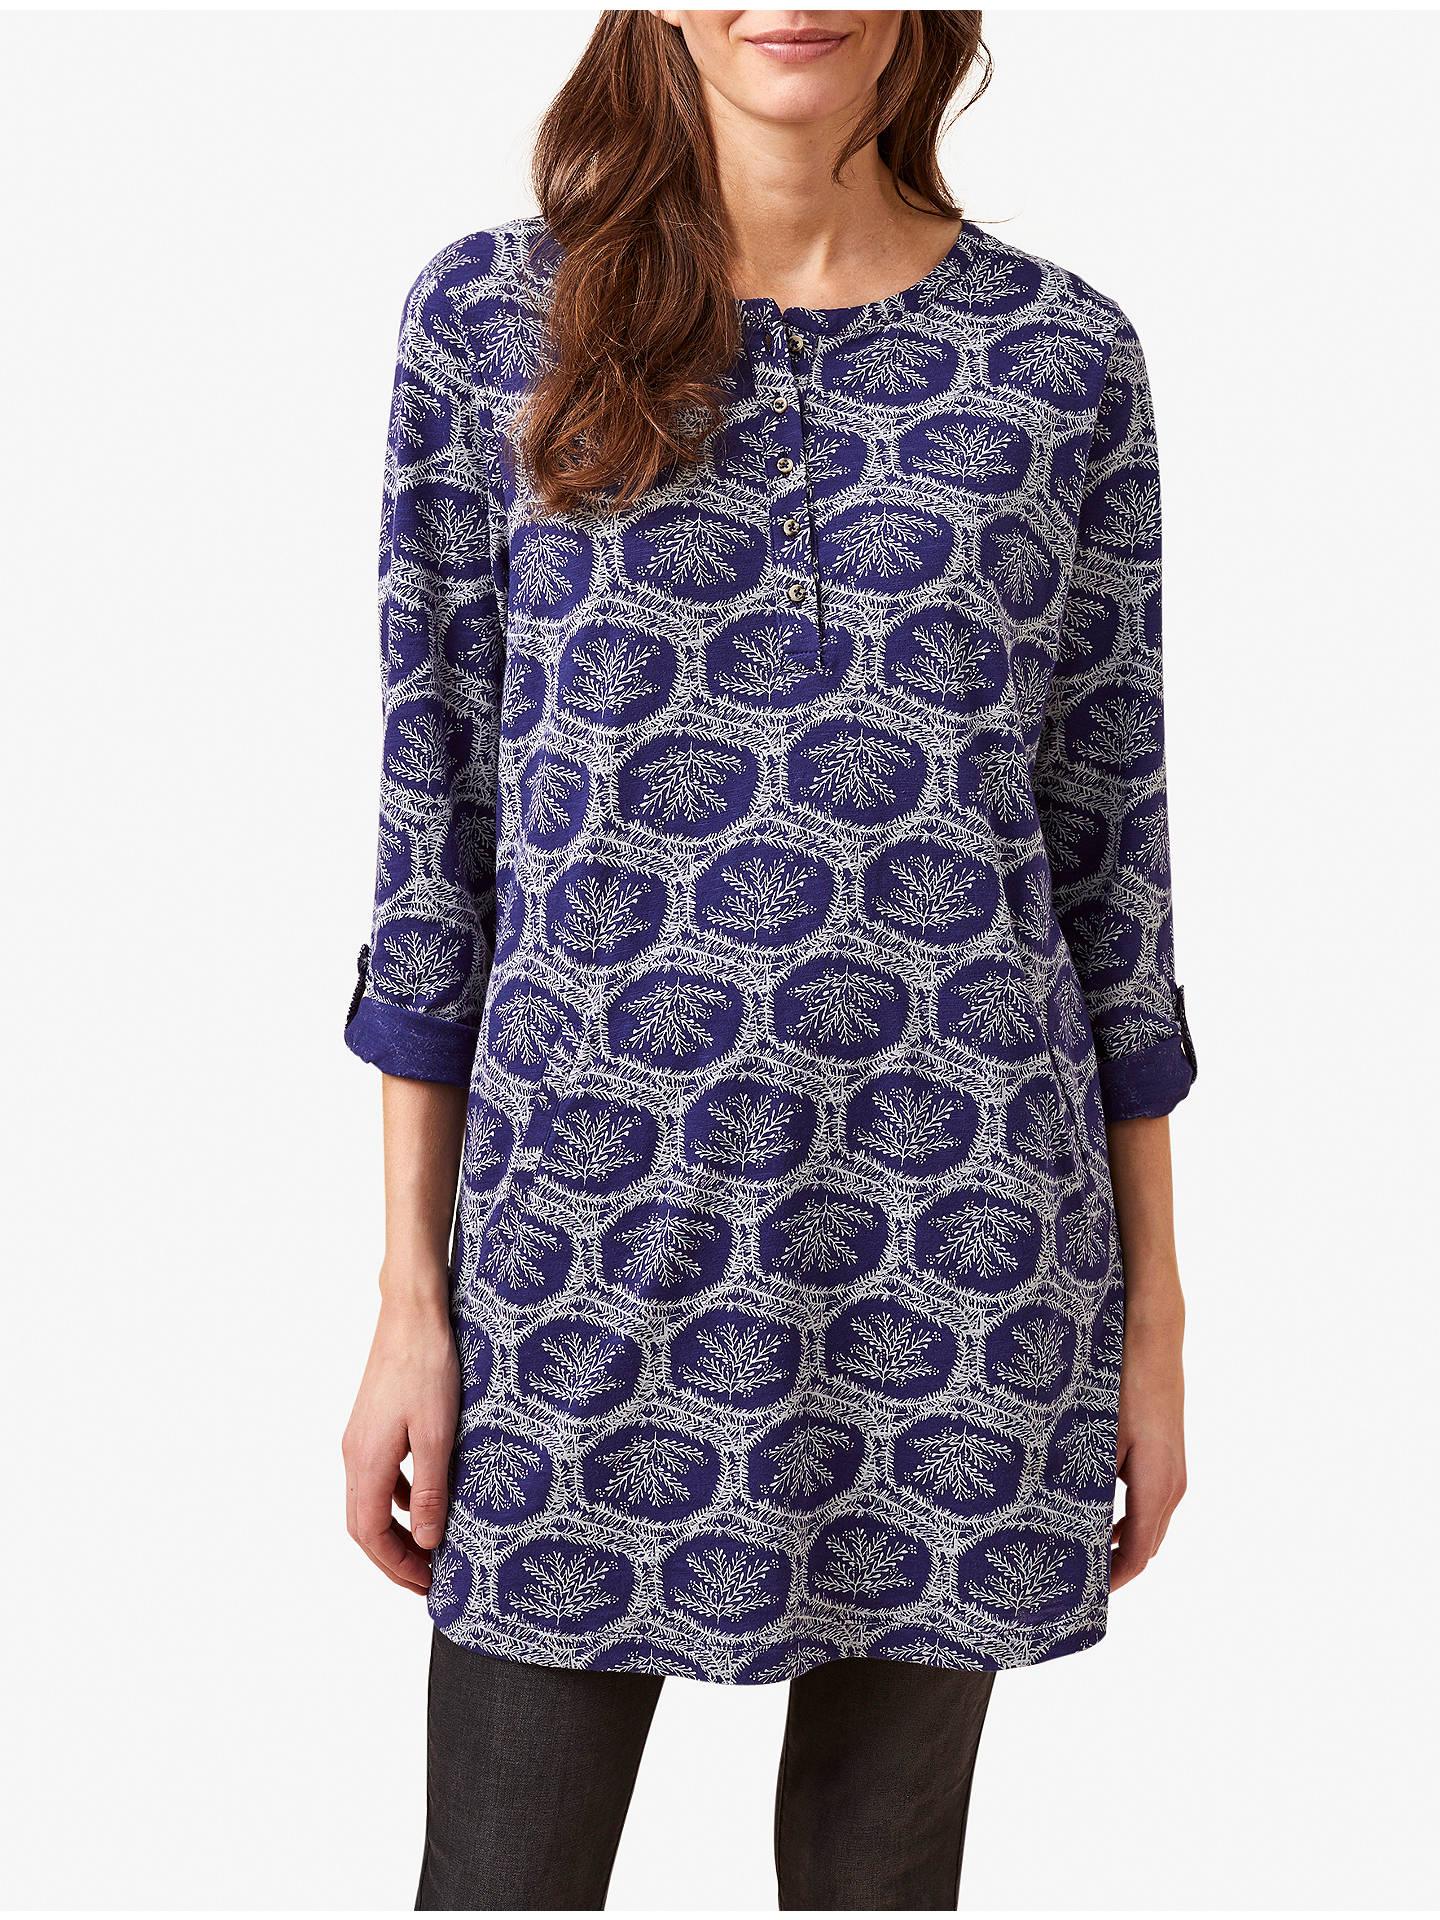 White Stuff Halles Printed Tunic Dress, Velvet Blue Print at